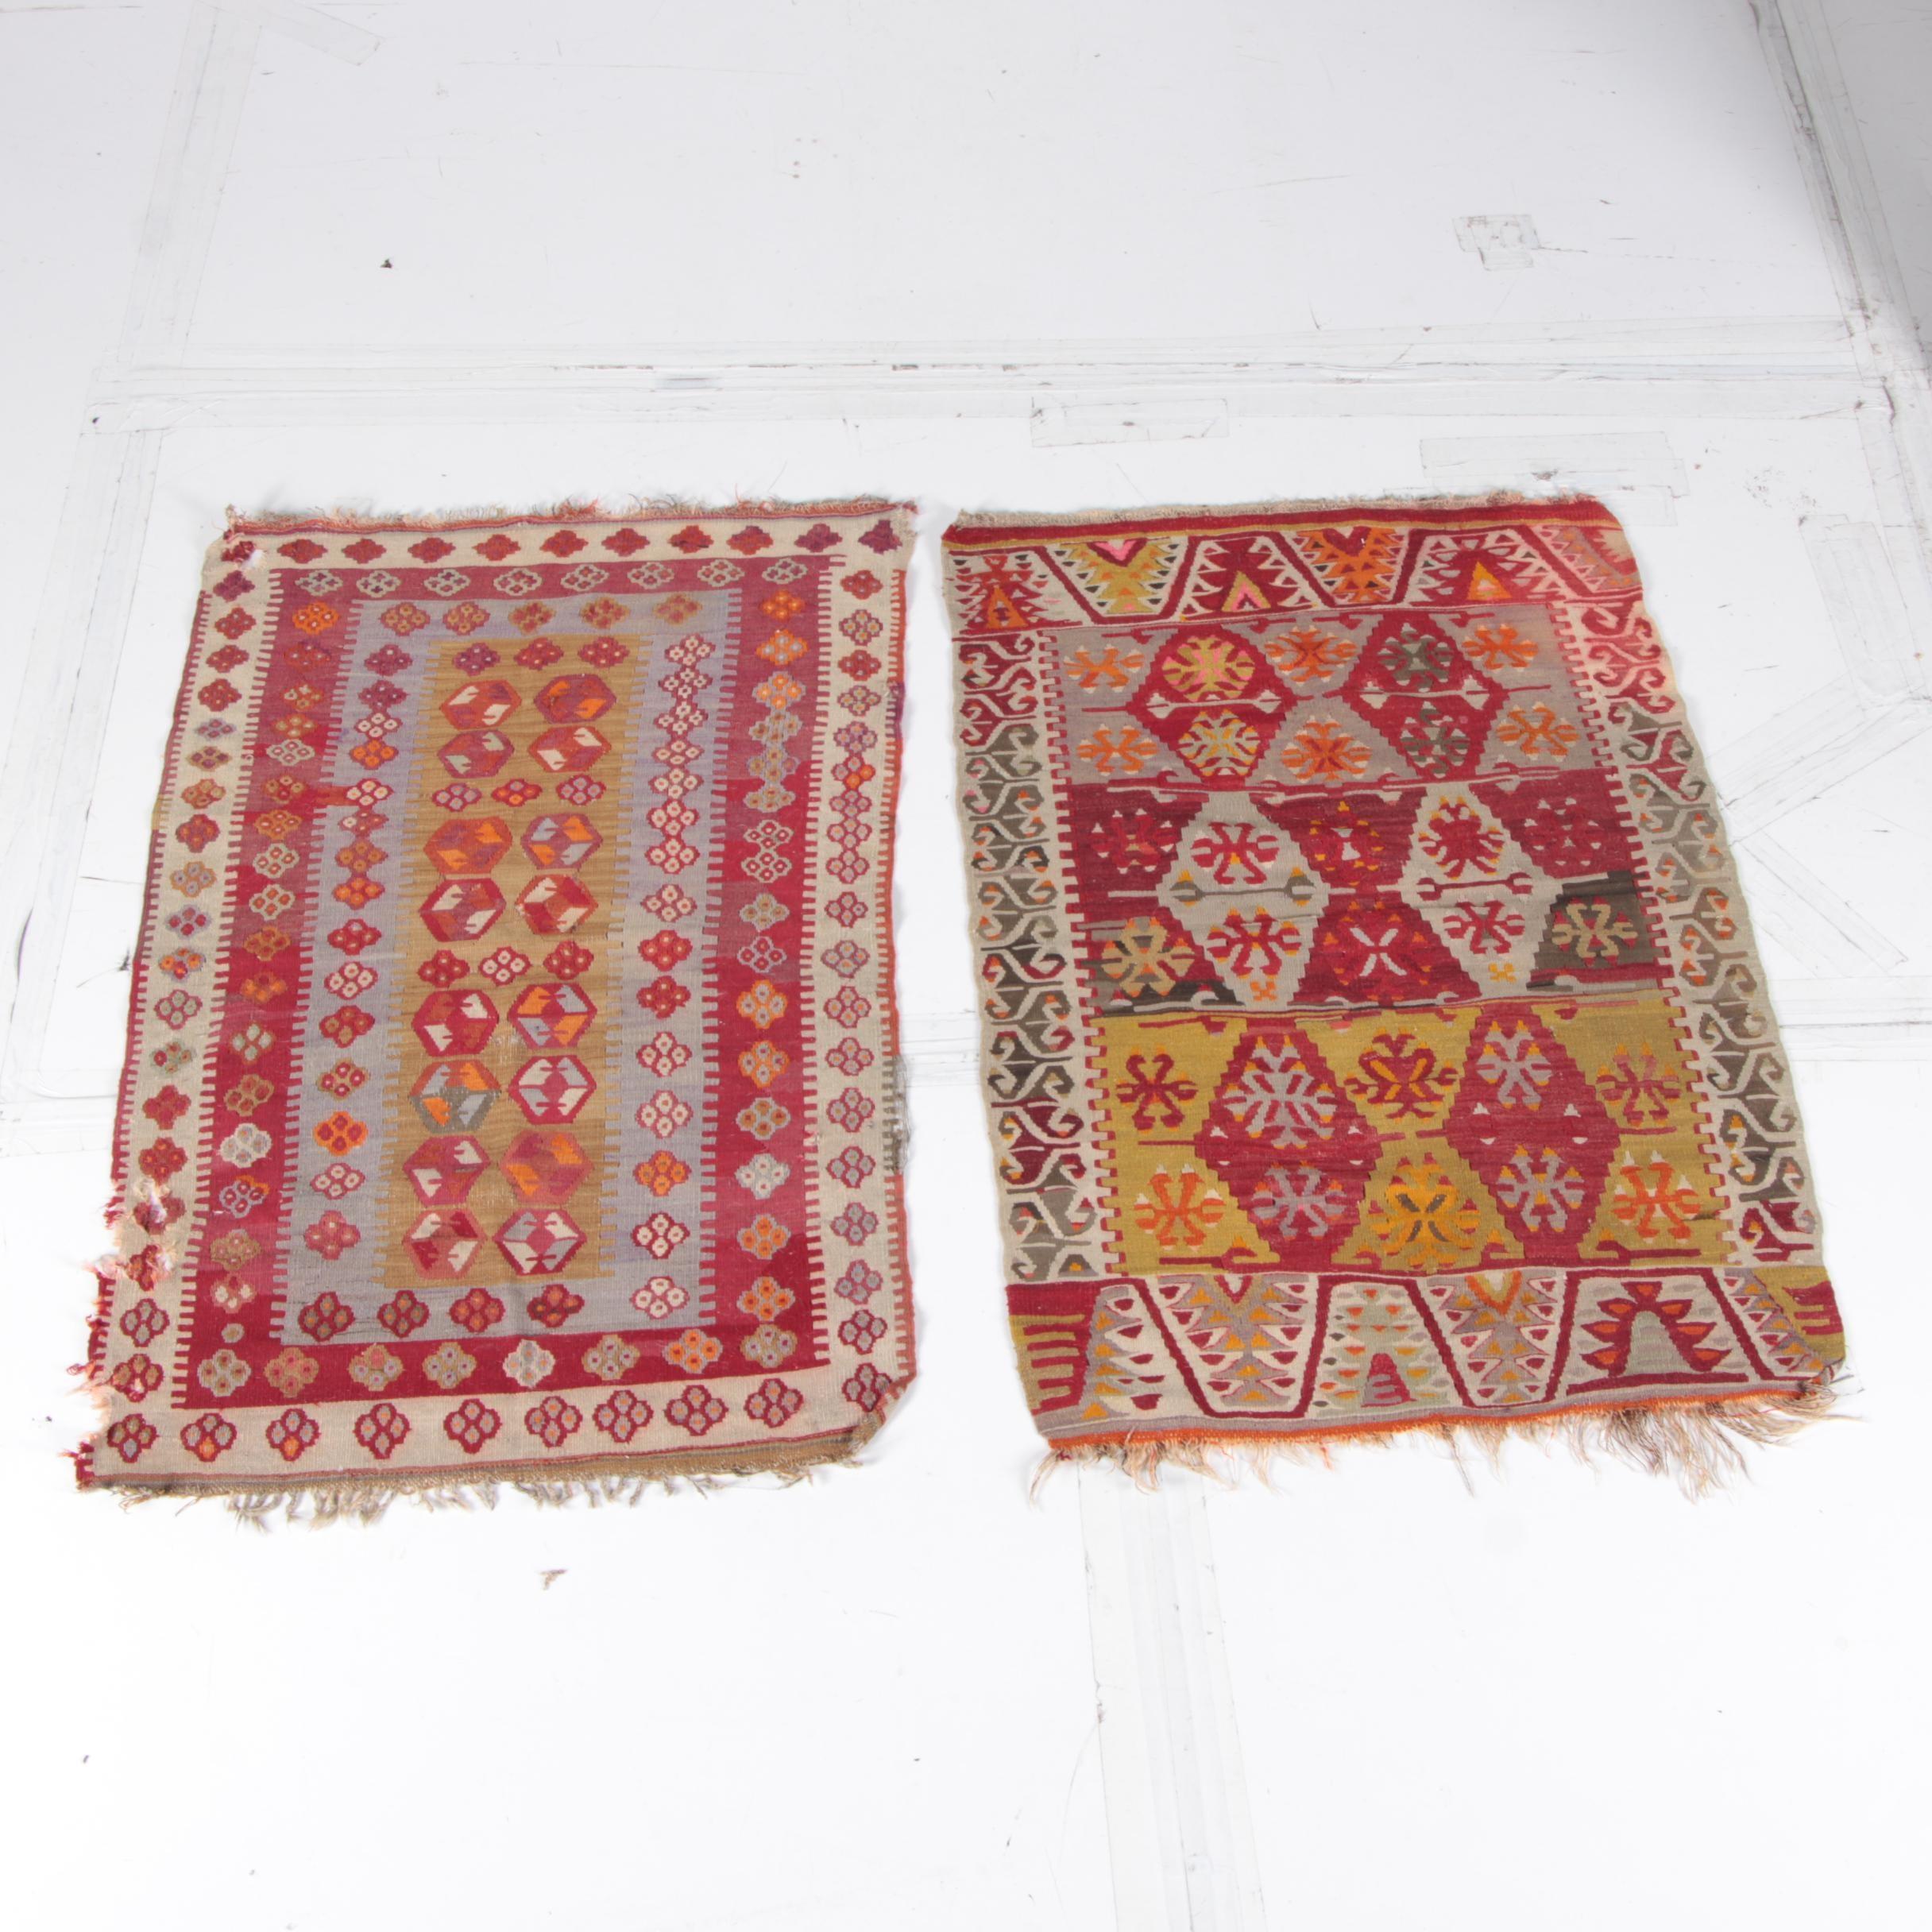 Handwoven Turkish Kilim Area Rugs